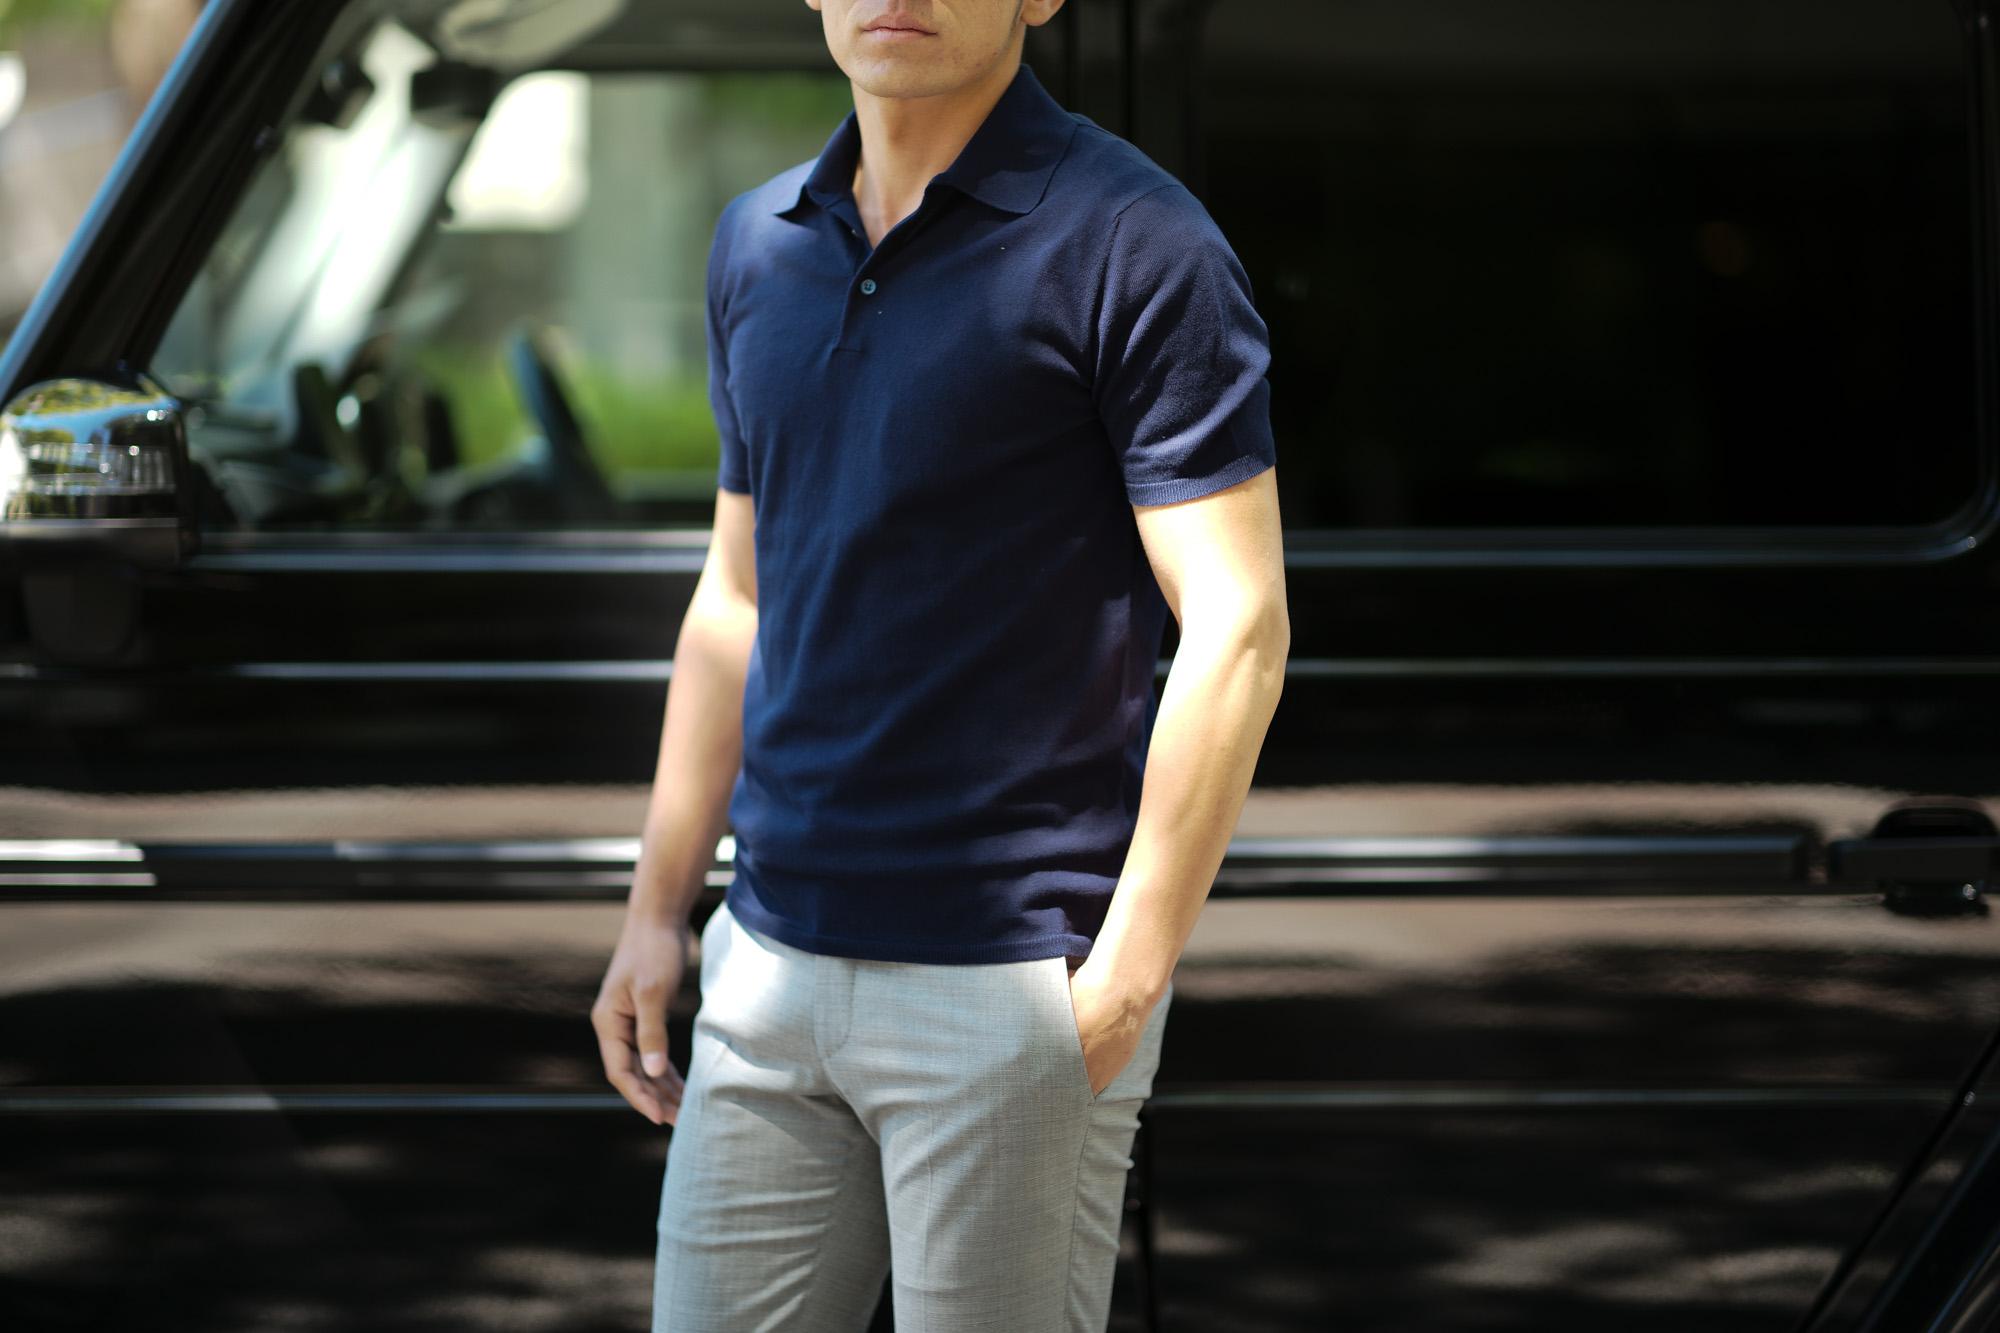 Cruciani (クルチアーニ) Knit Polo Shirt (ニット ポロシャツ) 27ゲージ コットン ニット ポロシャツ NAVY (ネイビー・Z0063) made in italy (イタリア製) 2019 春夏新作 愛知 名古屋 altoediritto アルトエデリット